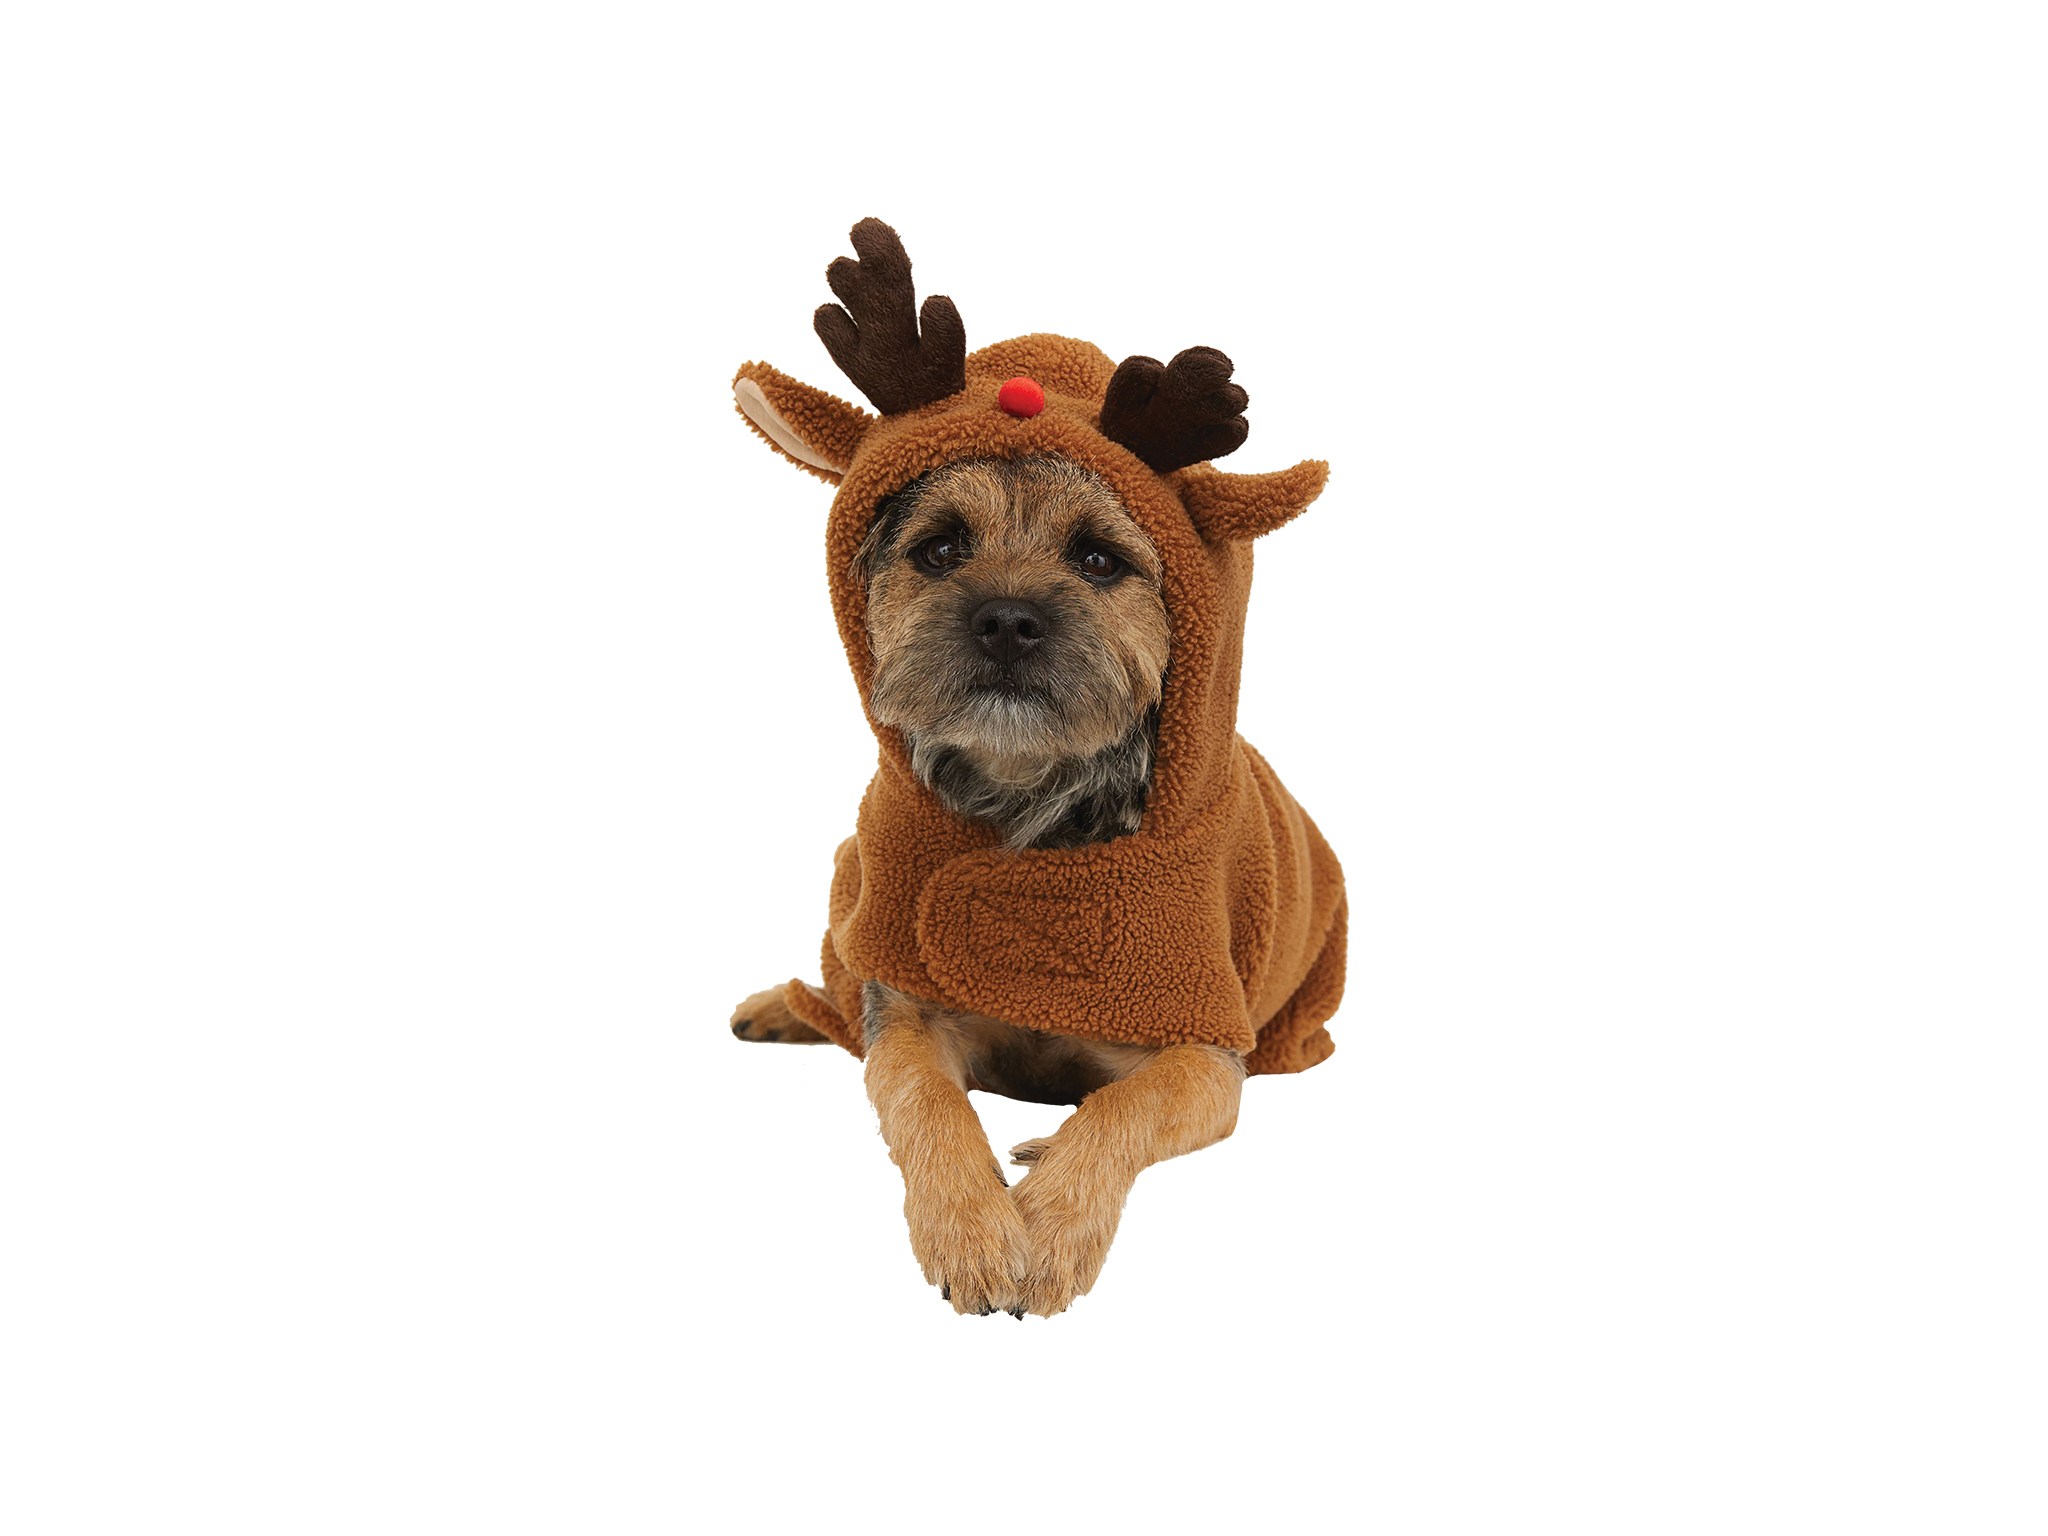 Presentes para Animais, Shopping Natal 2020, H&M